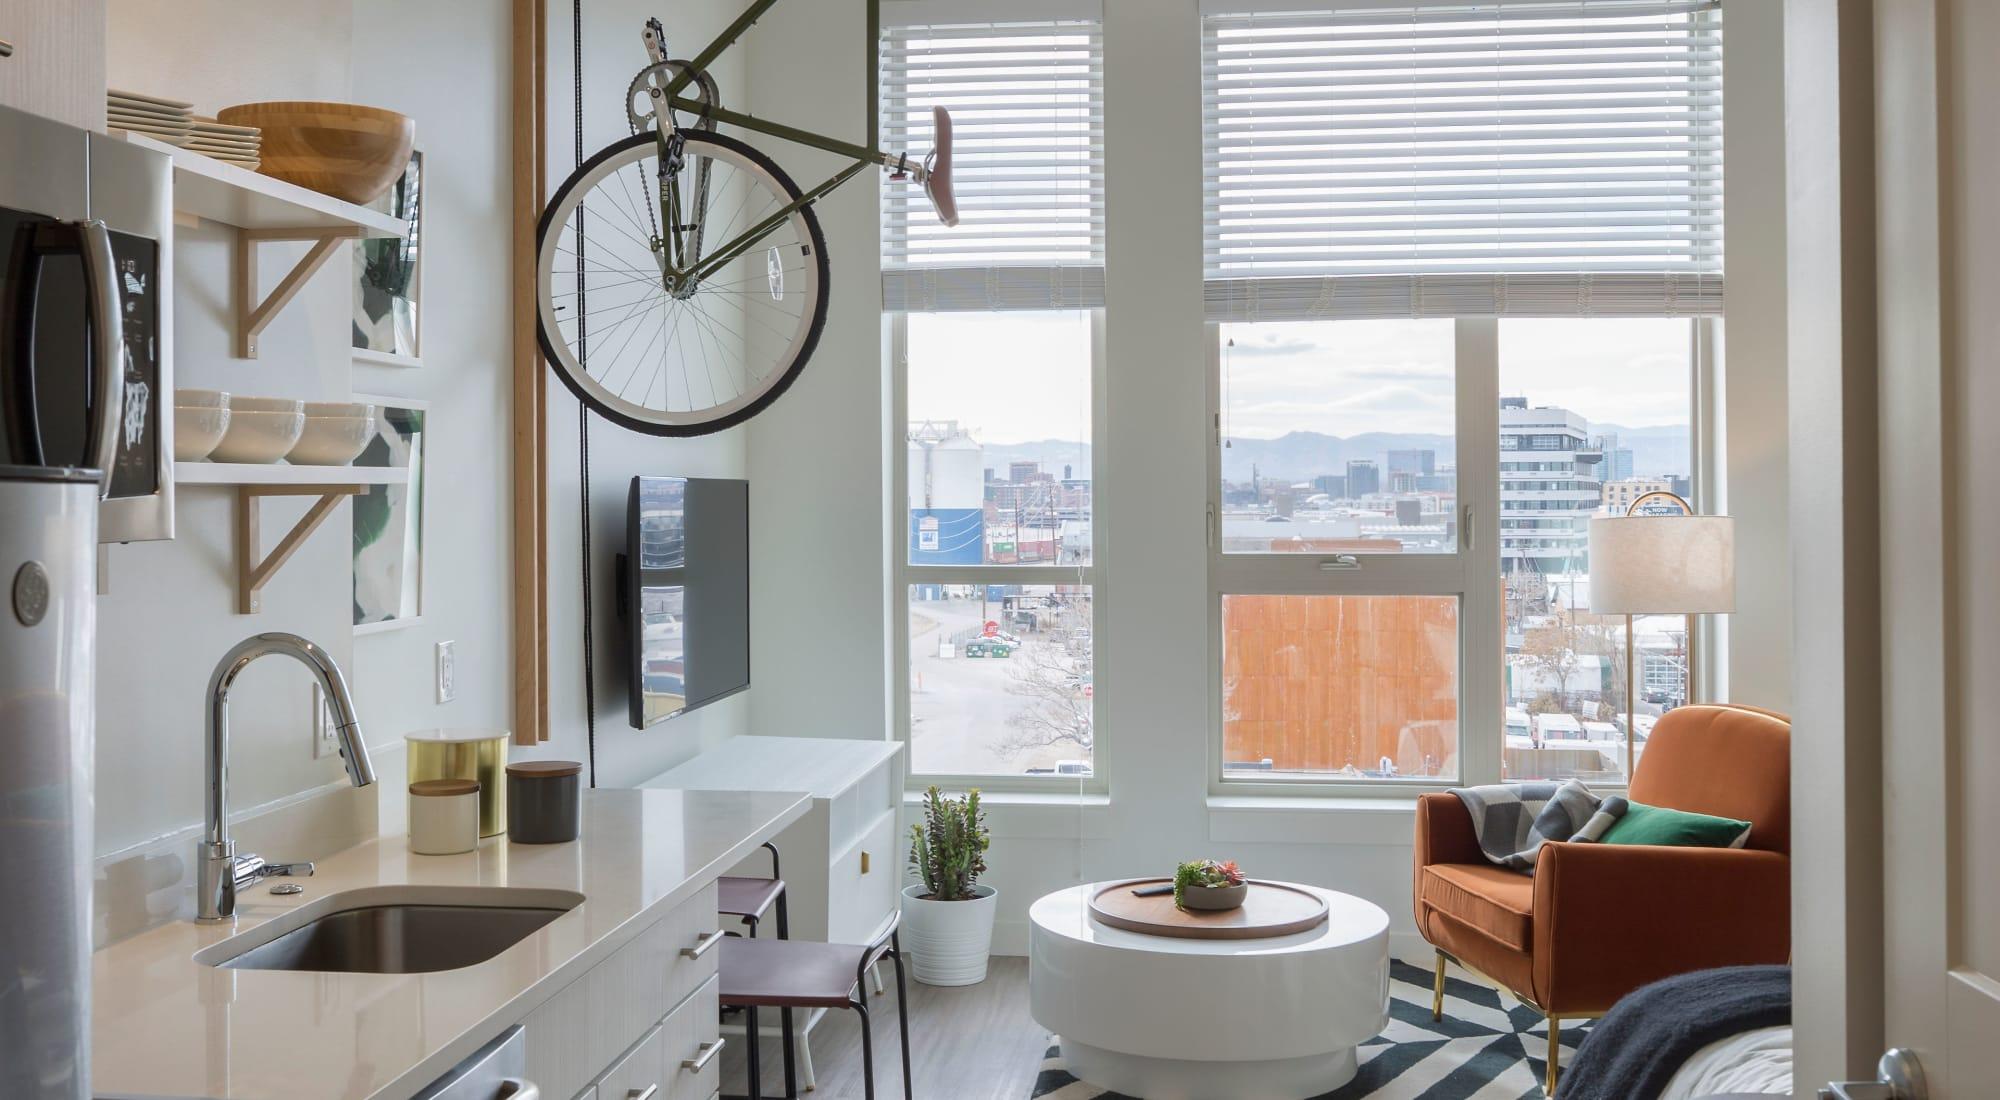 RiDE at RiNo apartments in Denver, Colorado